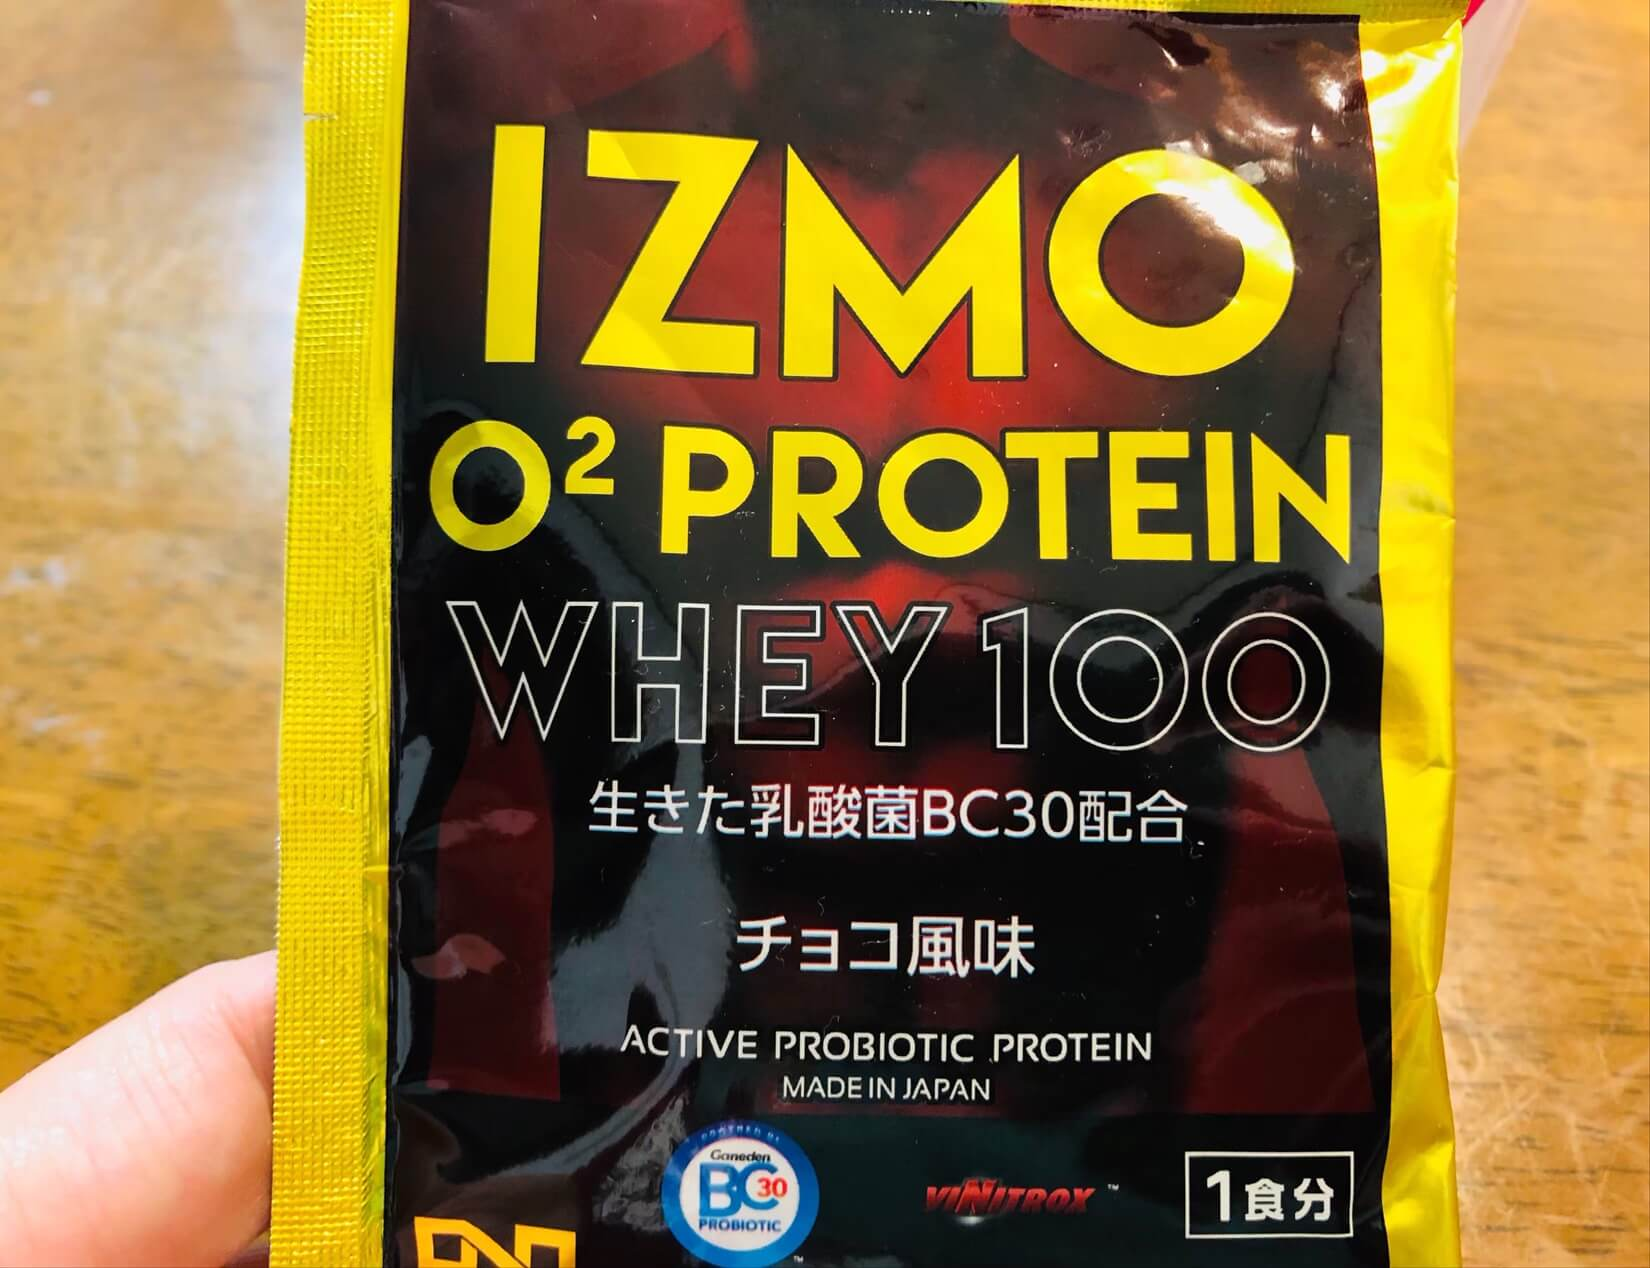 【IZMOO²プロテインチョコレート味】レビュー!